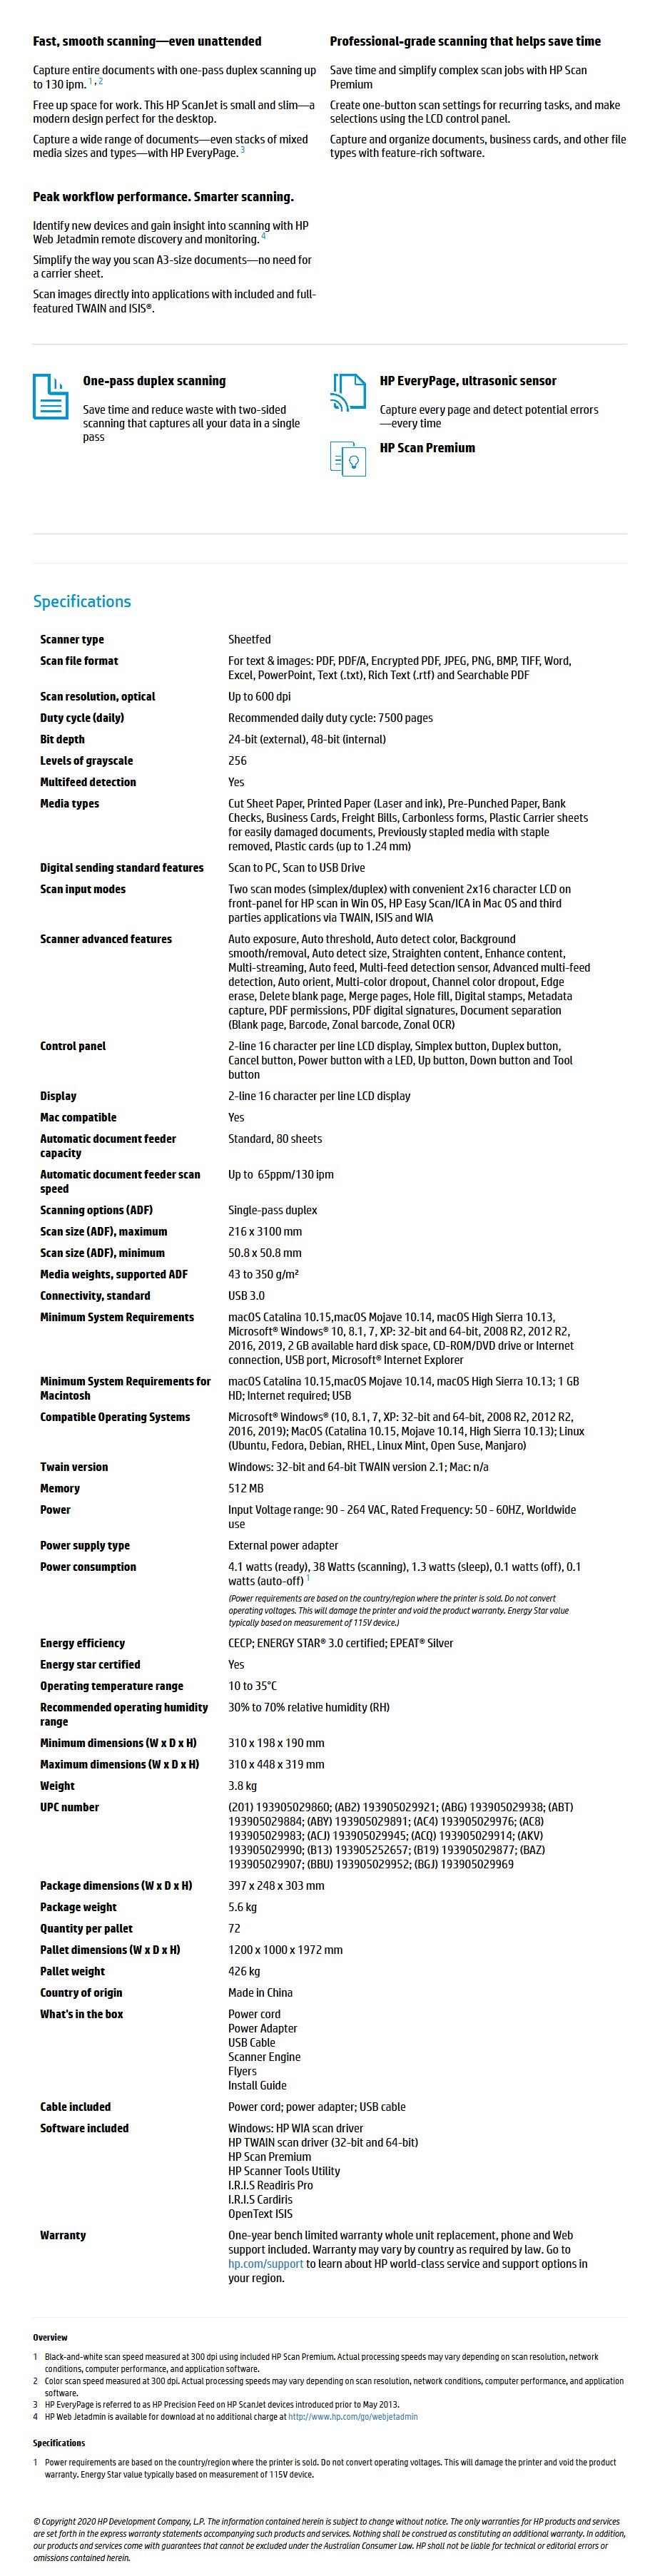 HP ScanJet Enterprise Flow 5000 s5 Sheet Feed Document Scanner - Overview 1